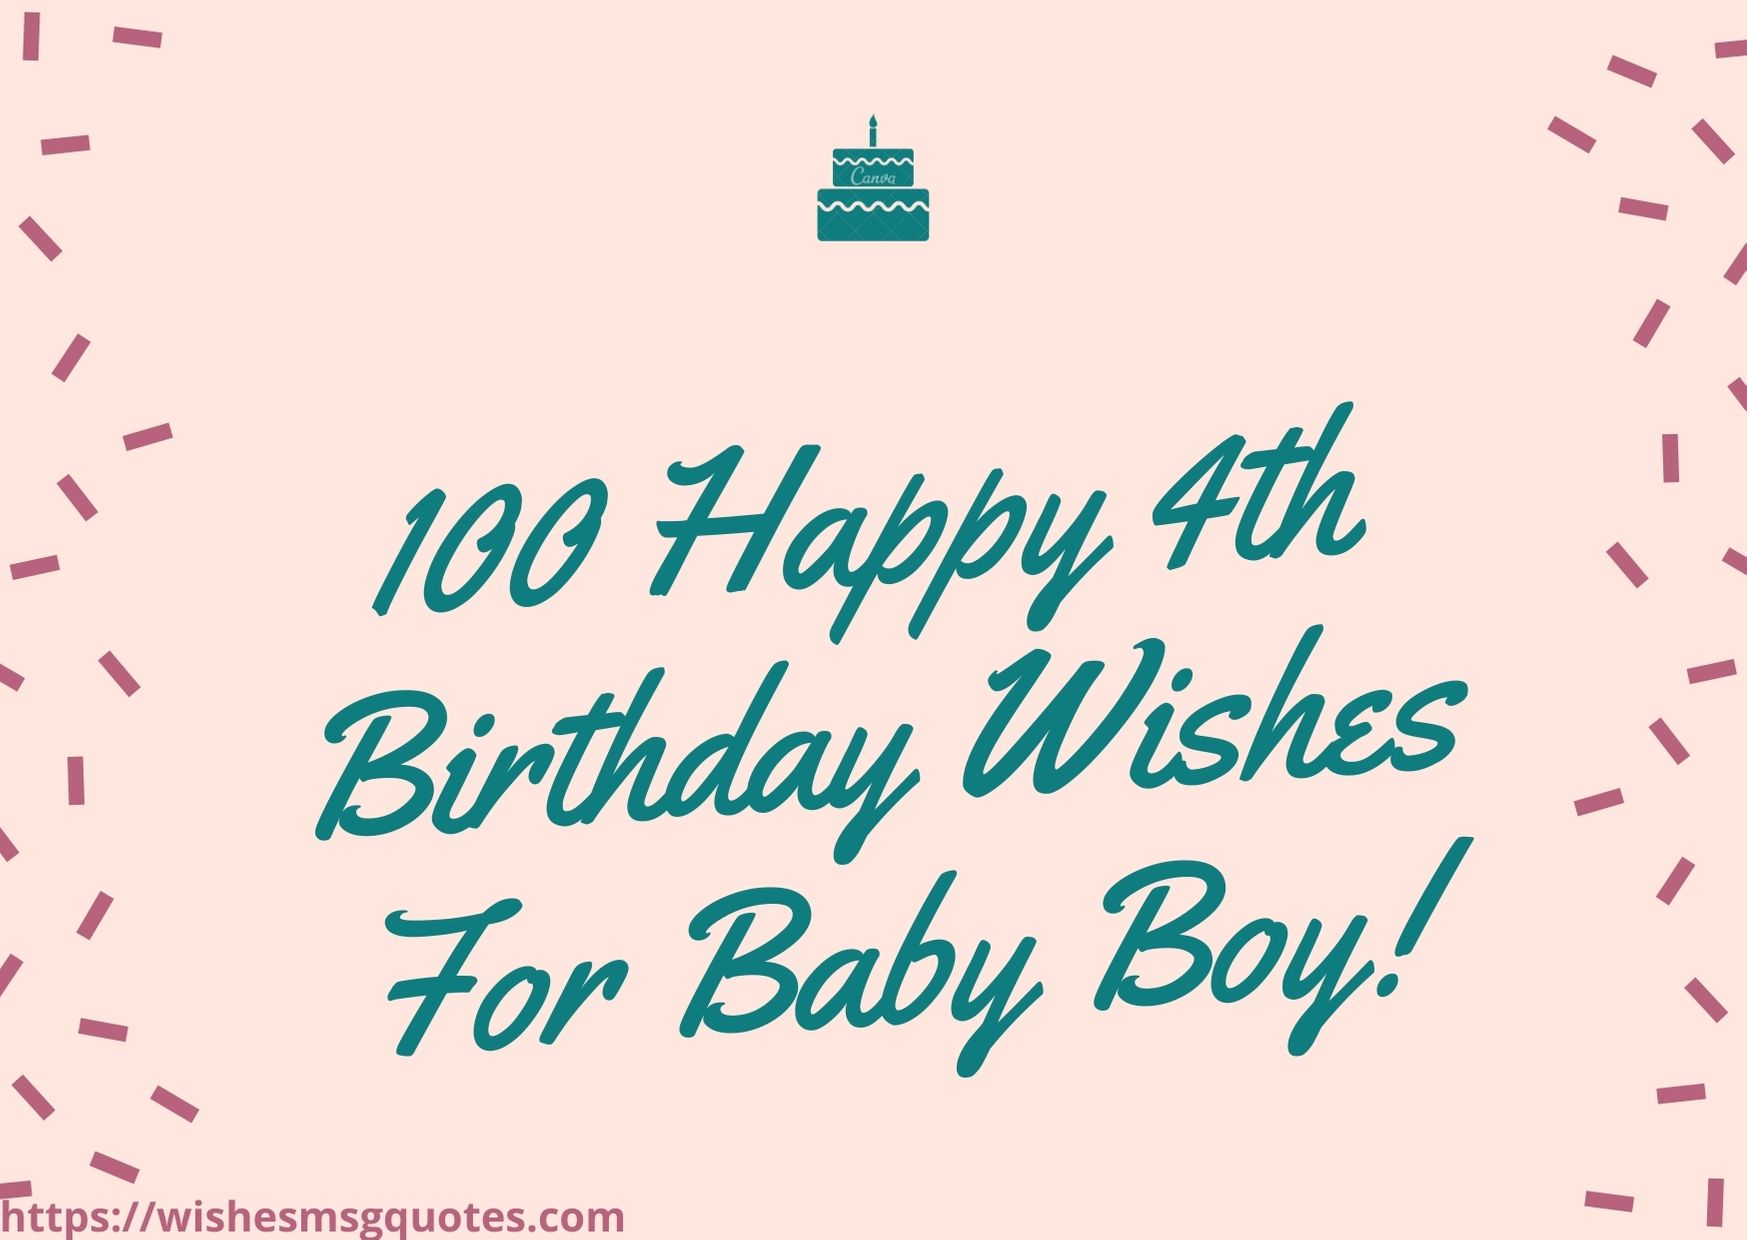 100 Happy 4th Birthday Wishes For Baby Boy